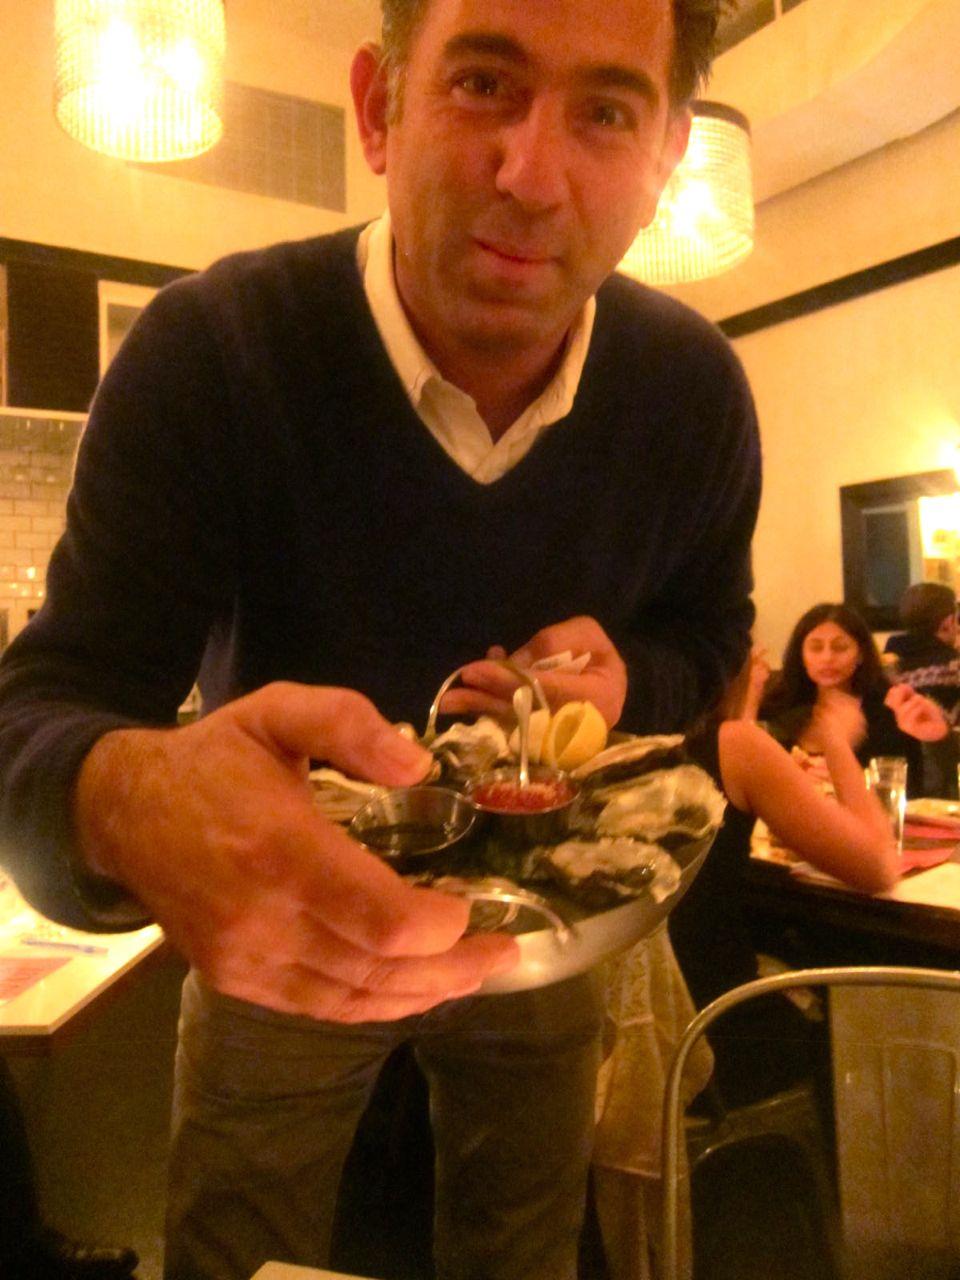 Co-owner Eric Lemonides' sweetness never flags, as he runs between restaurants.